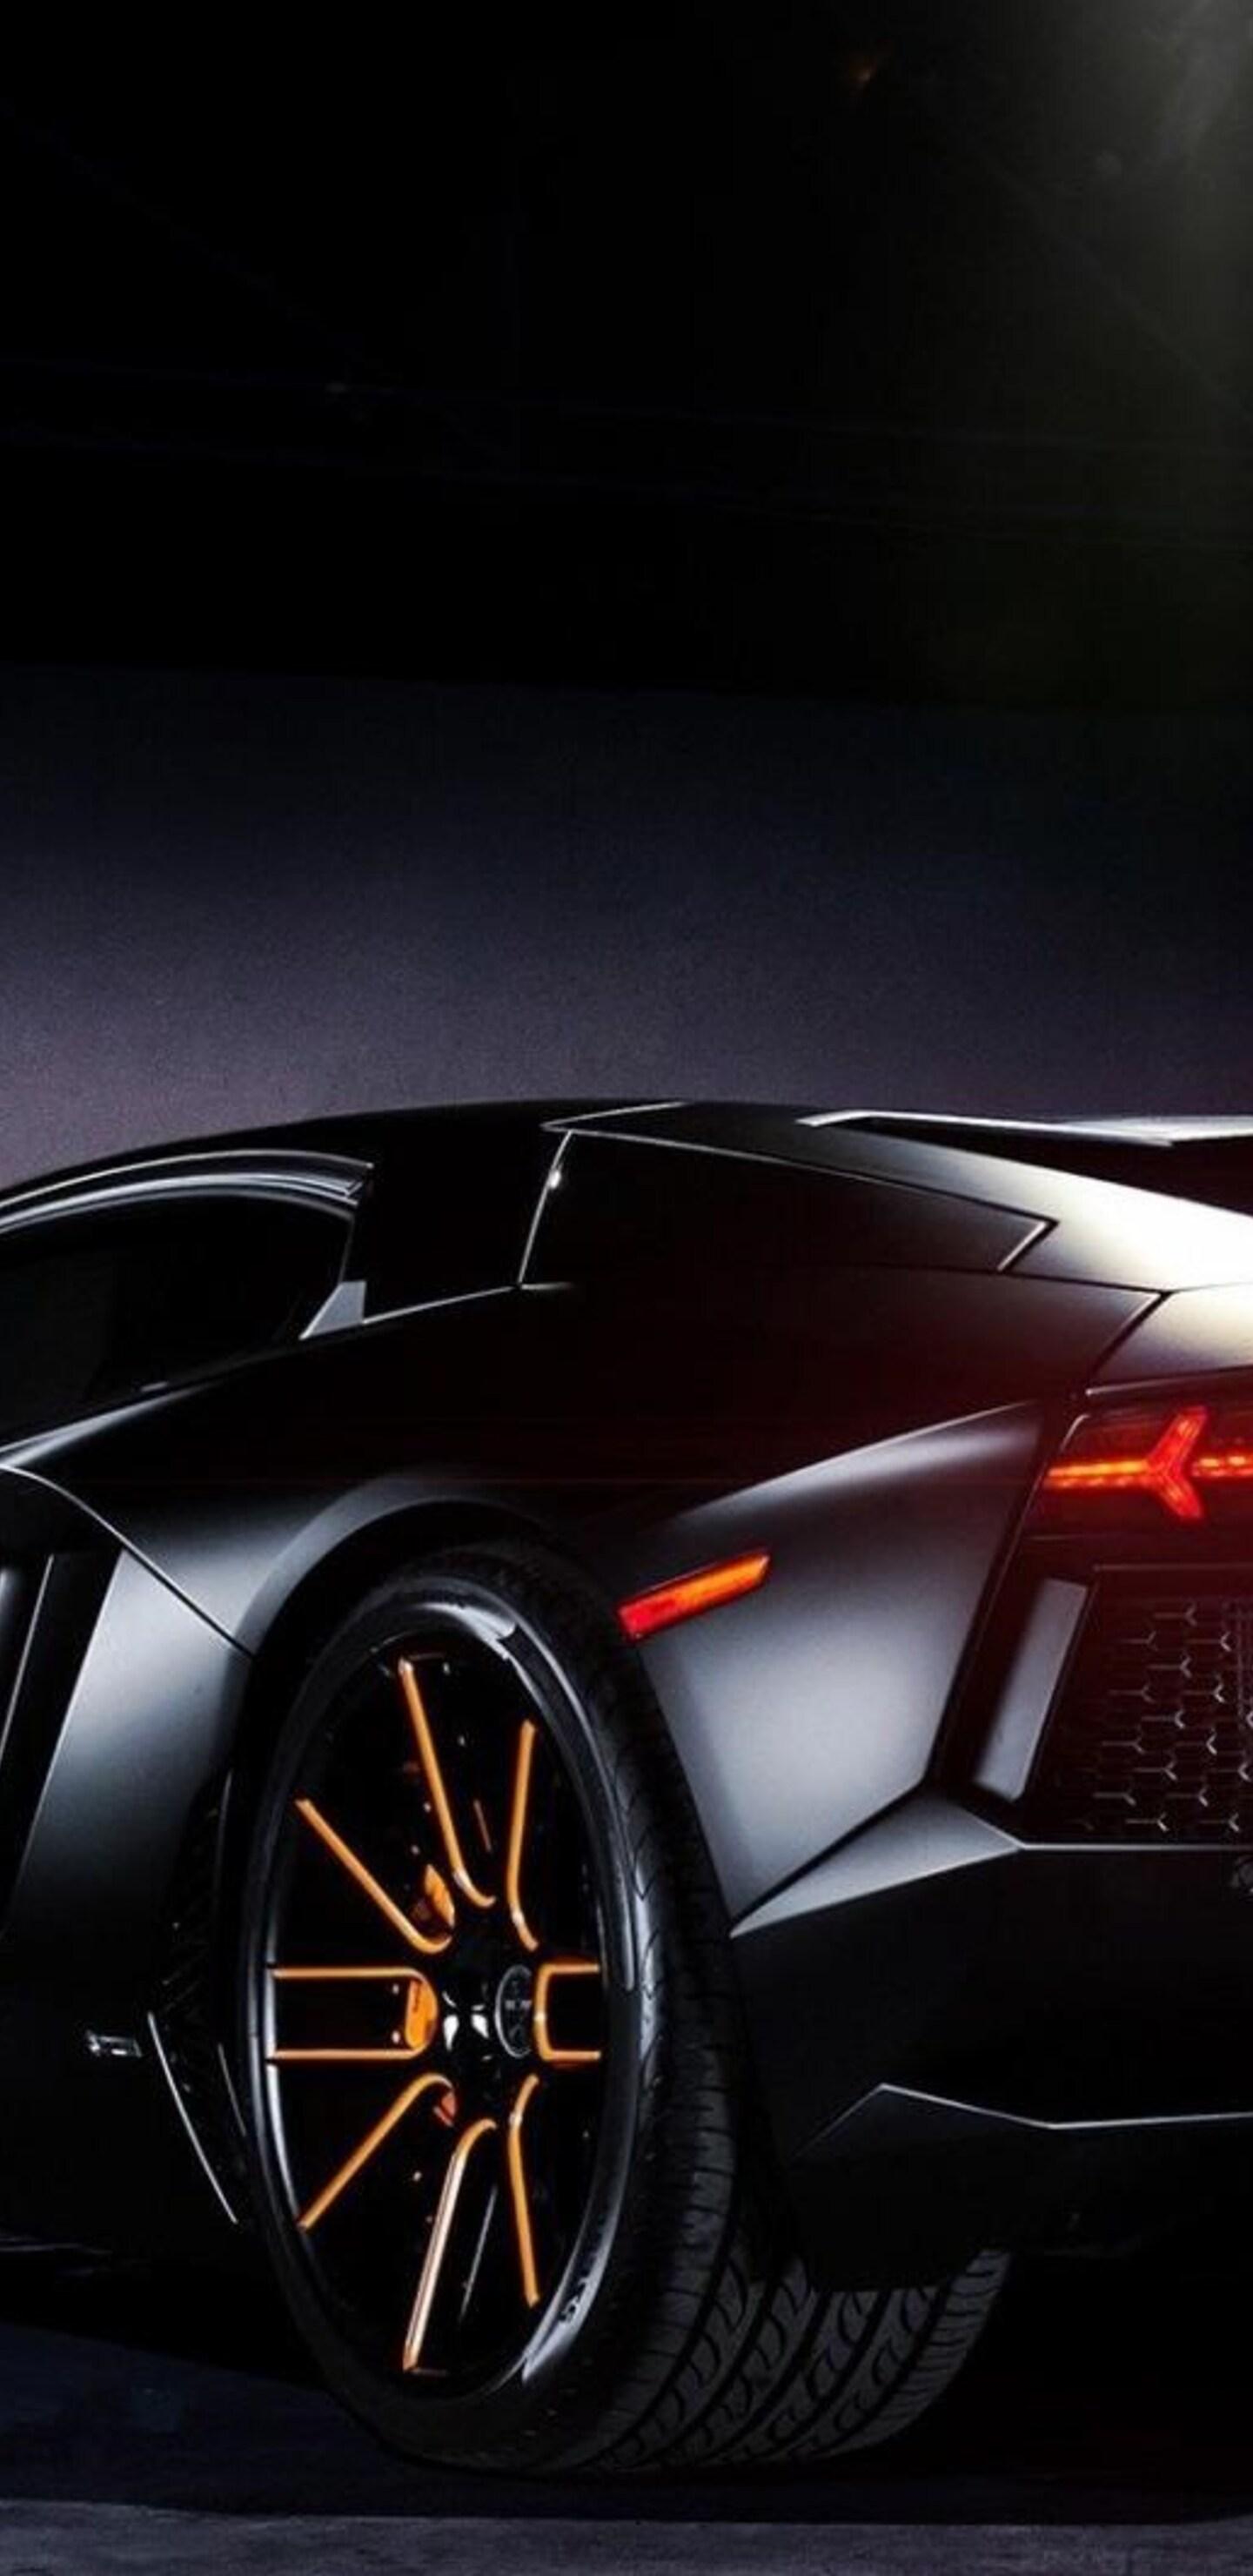 1440x2960 Lamborghini Black Samsung Galaxy Note 9 8 S9 S8 S8 Qhd